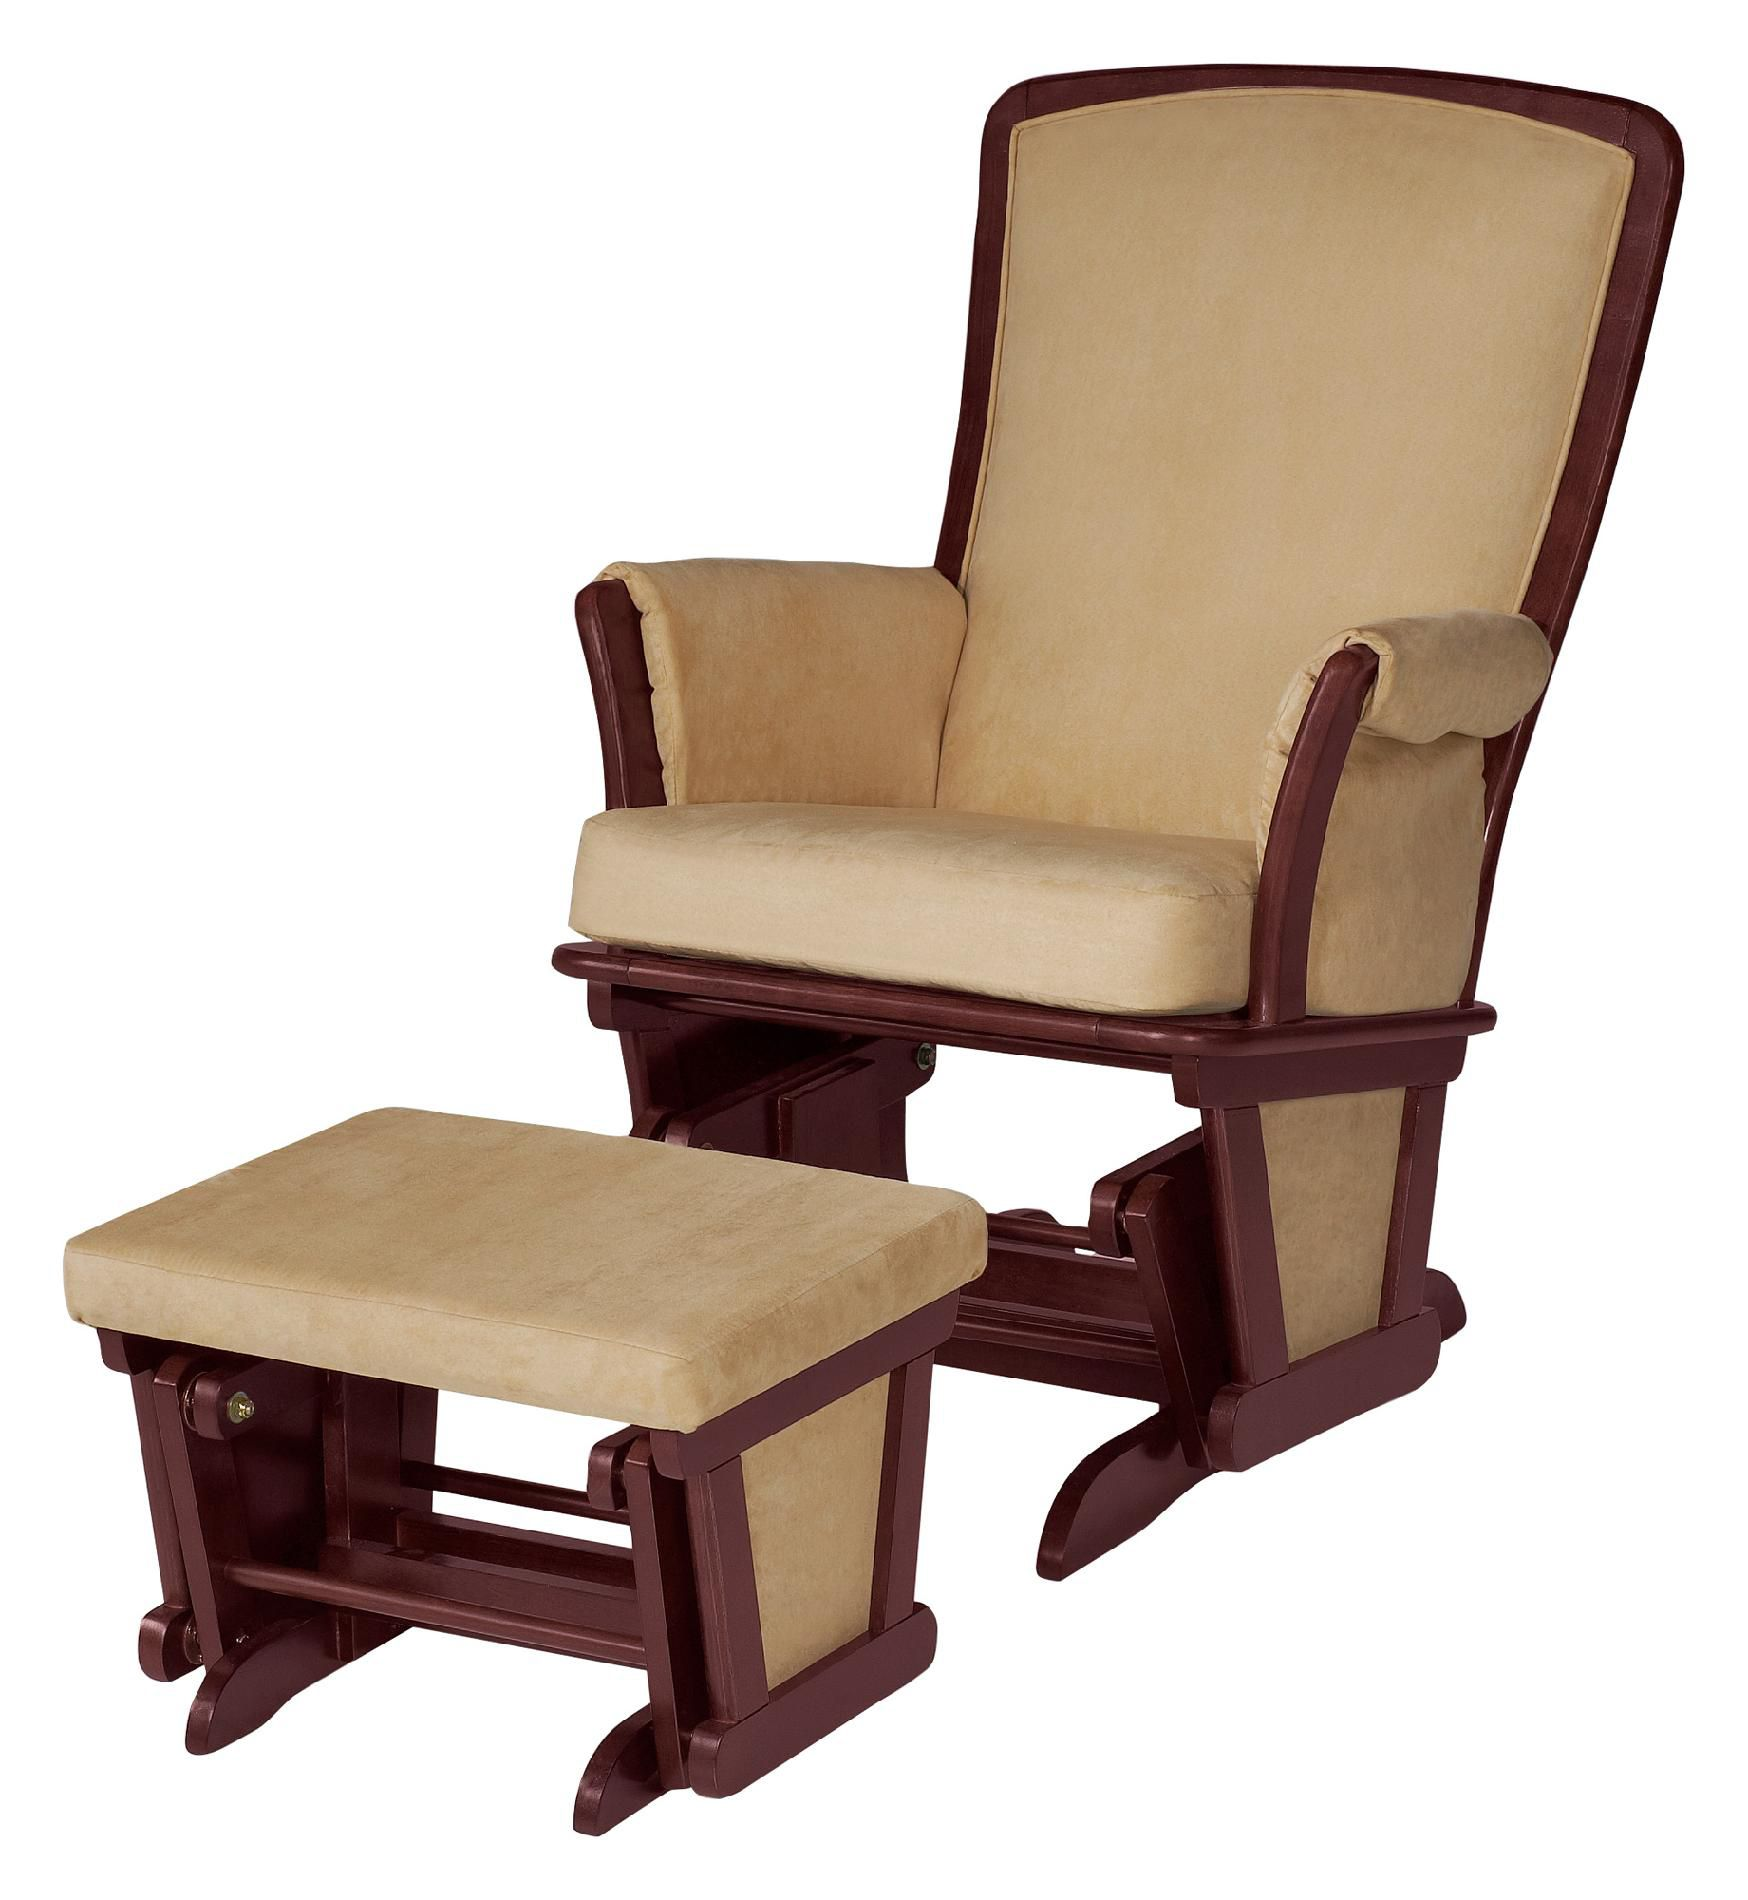 childcare glider rocking chair ottoman walnut accent chairs under 100 dollars delta children upholstered and chocolate